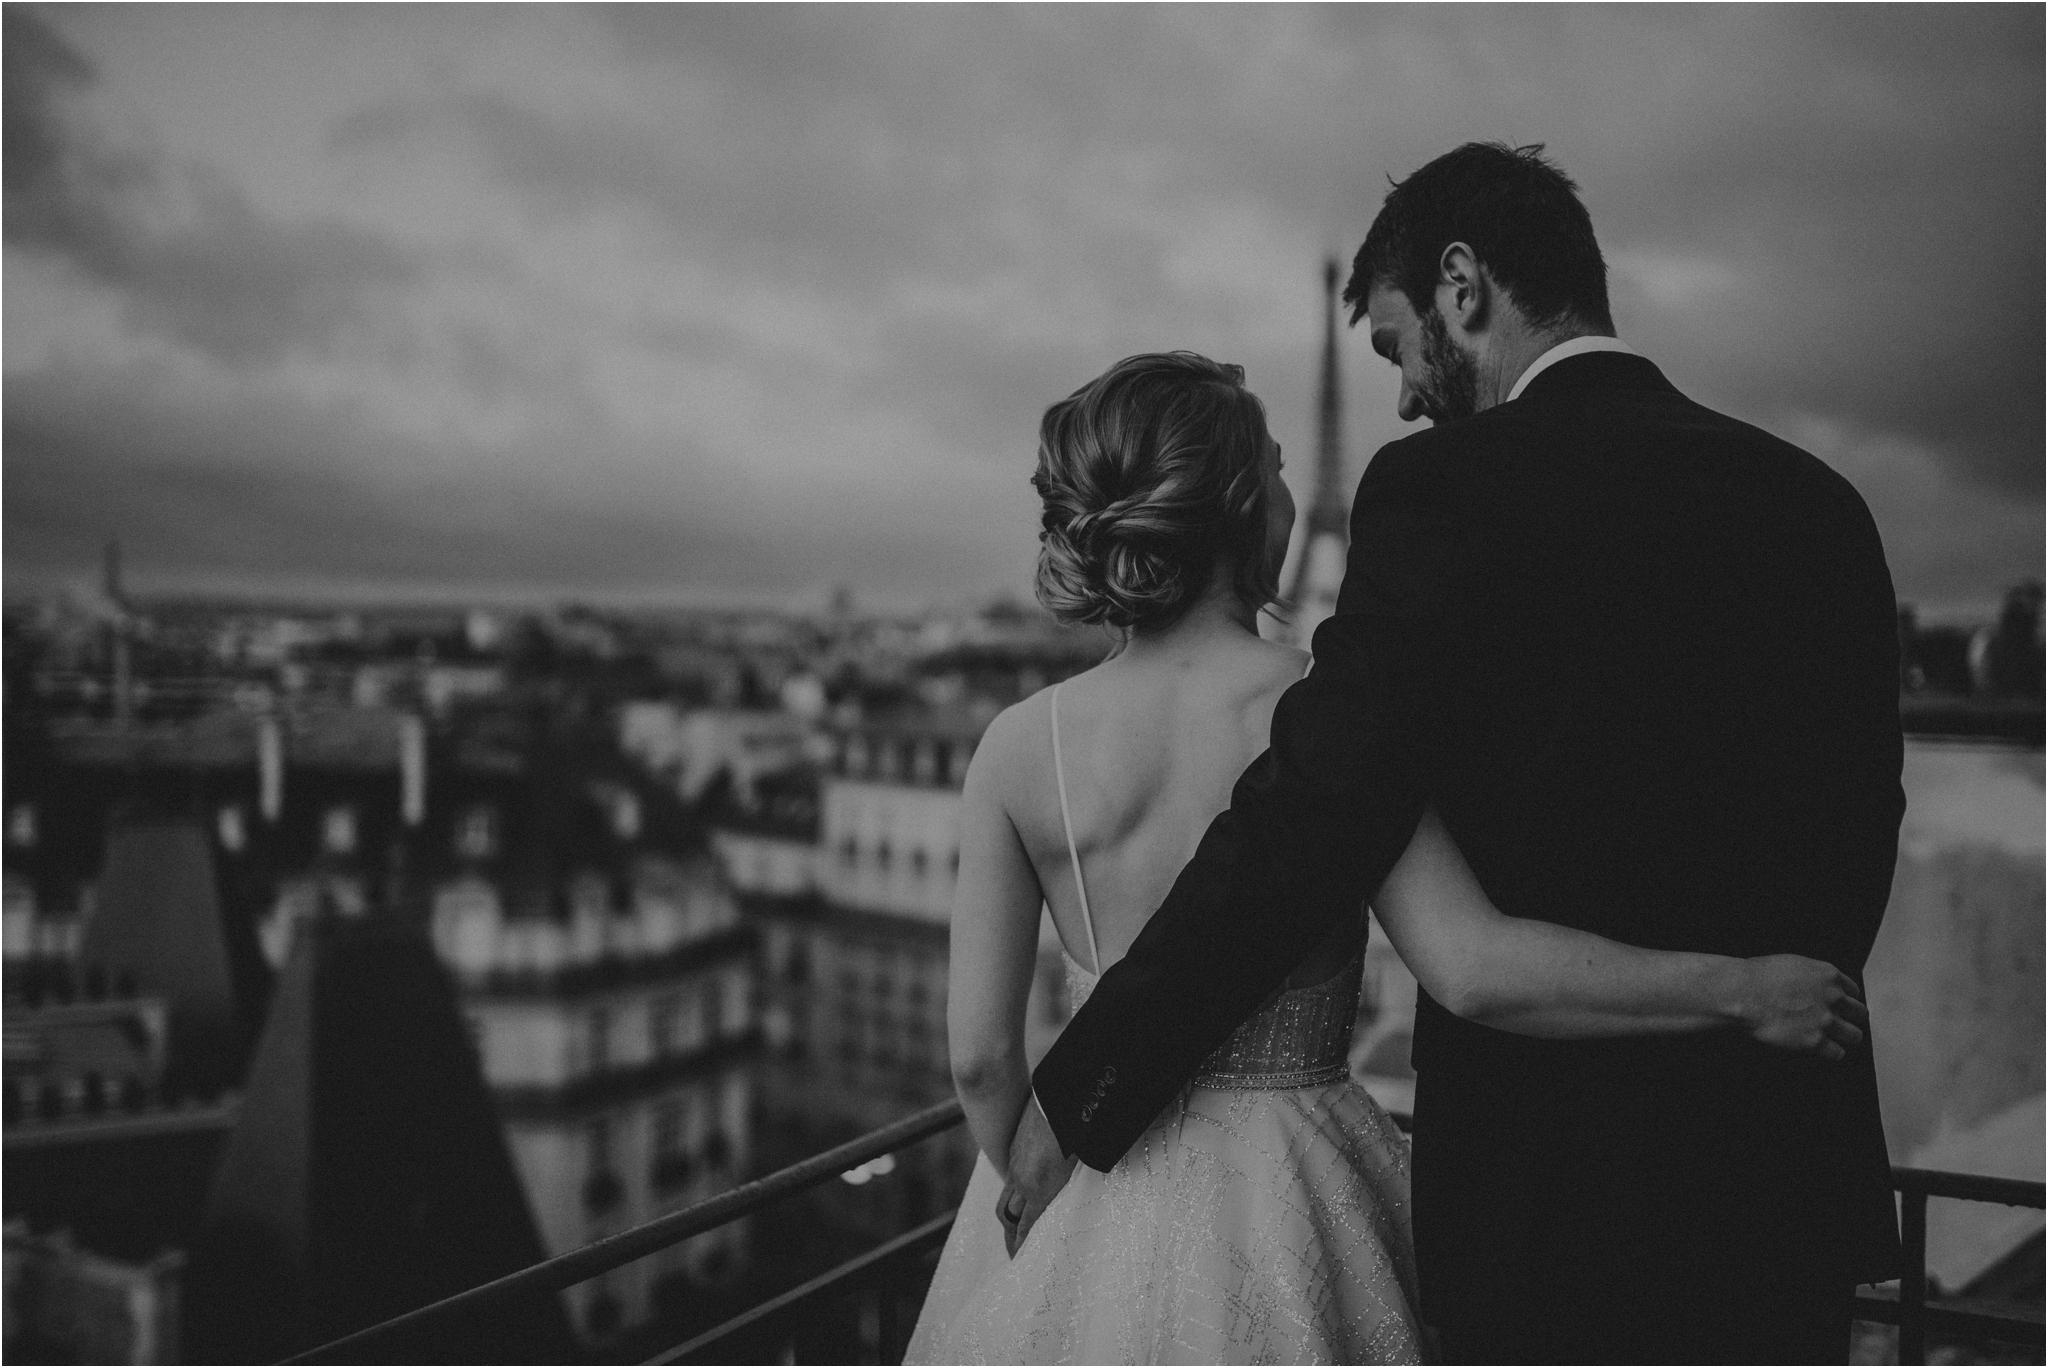 miranda-and-jared-paris-elopement-destination-wedding-photographer-021.jpg